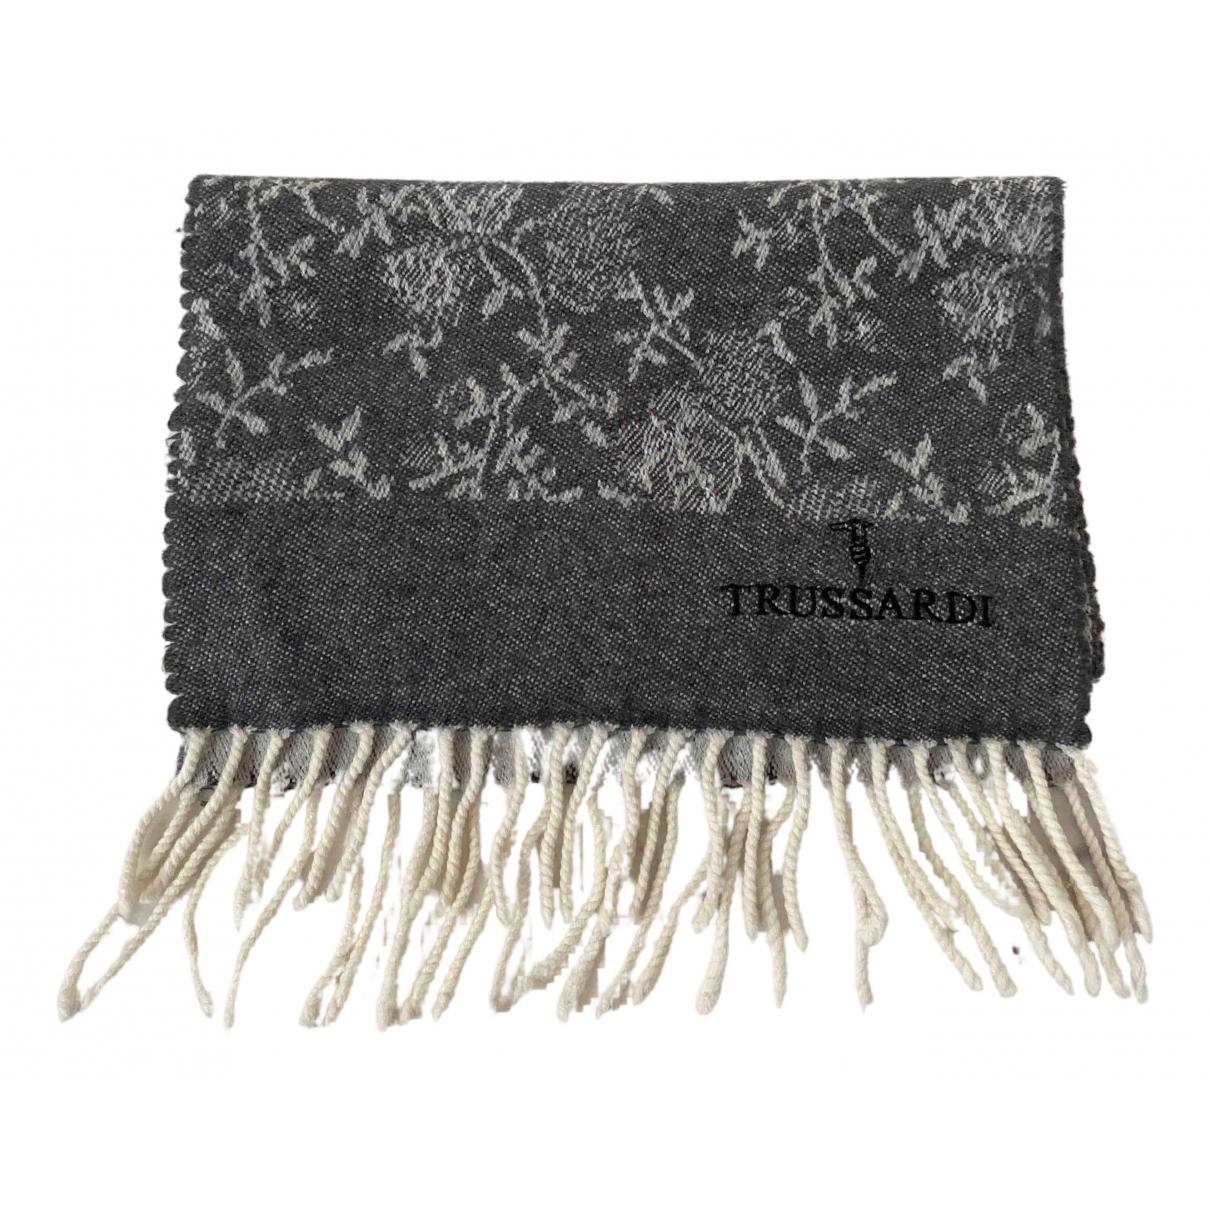 Trussardi \N Schal in  Grau Wolle